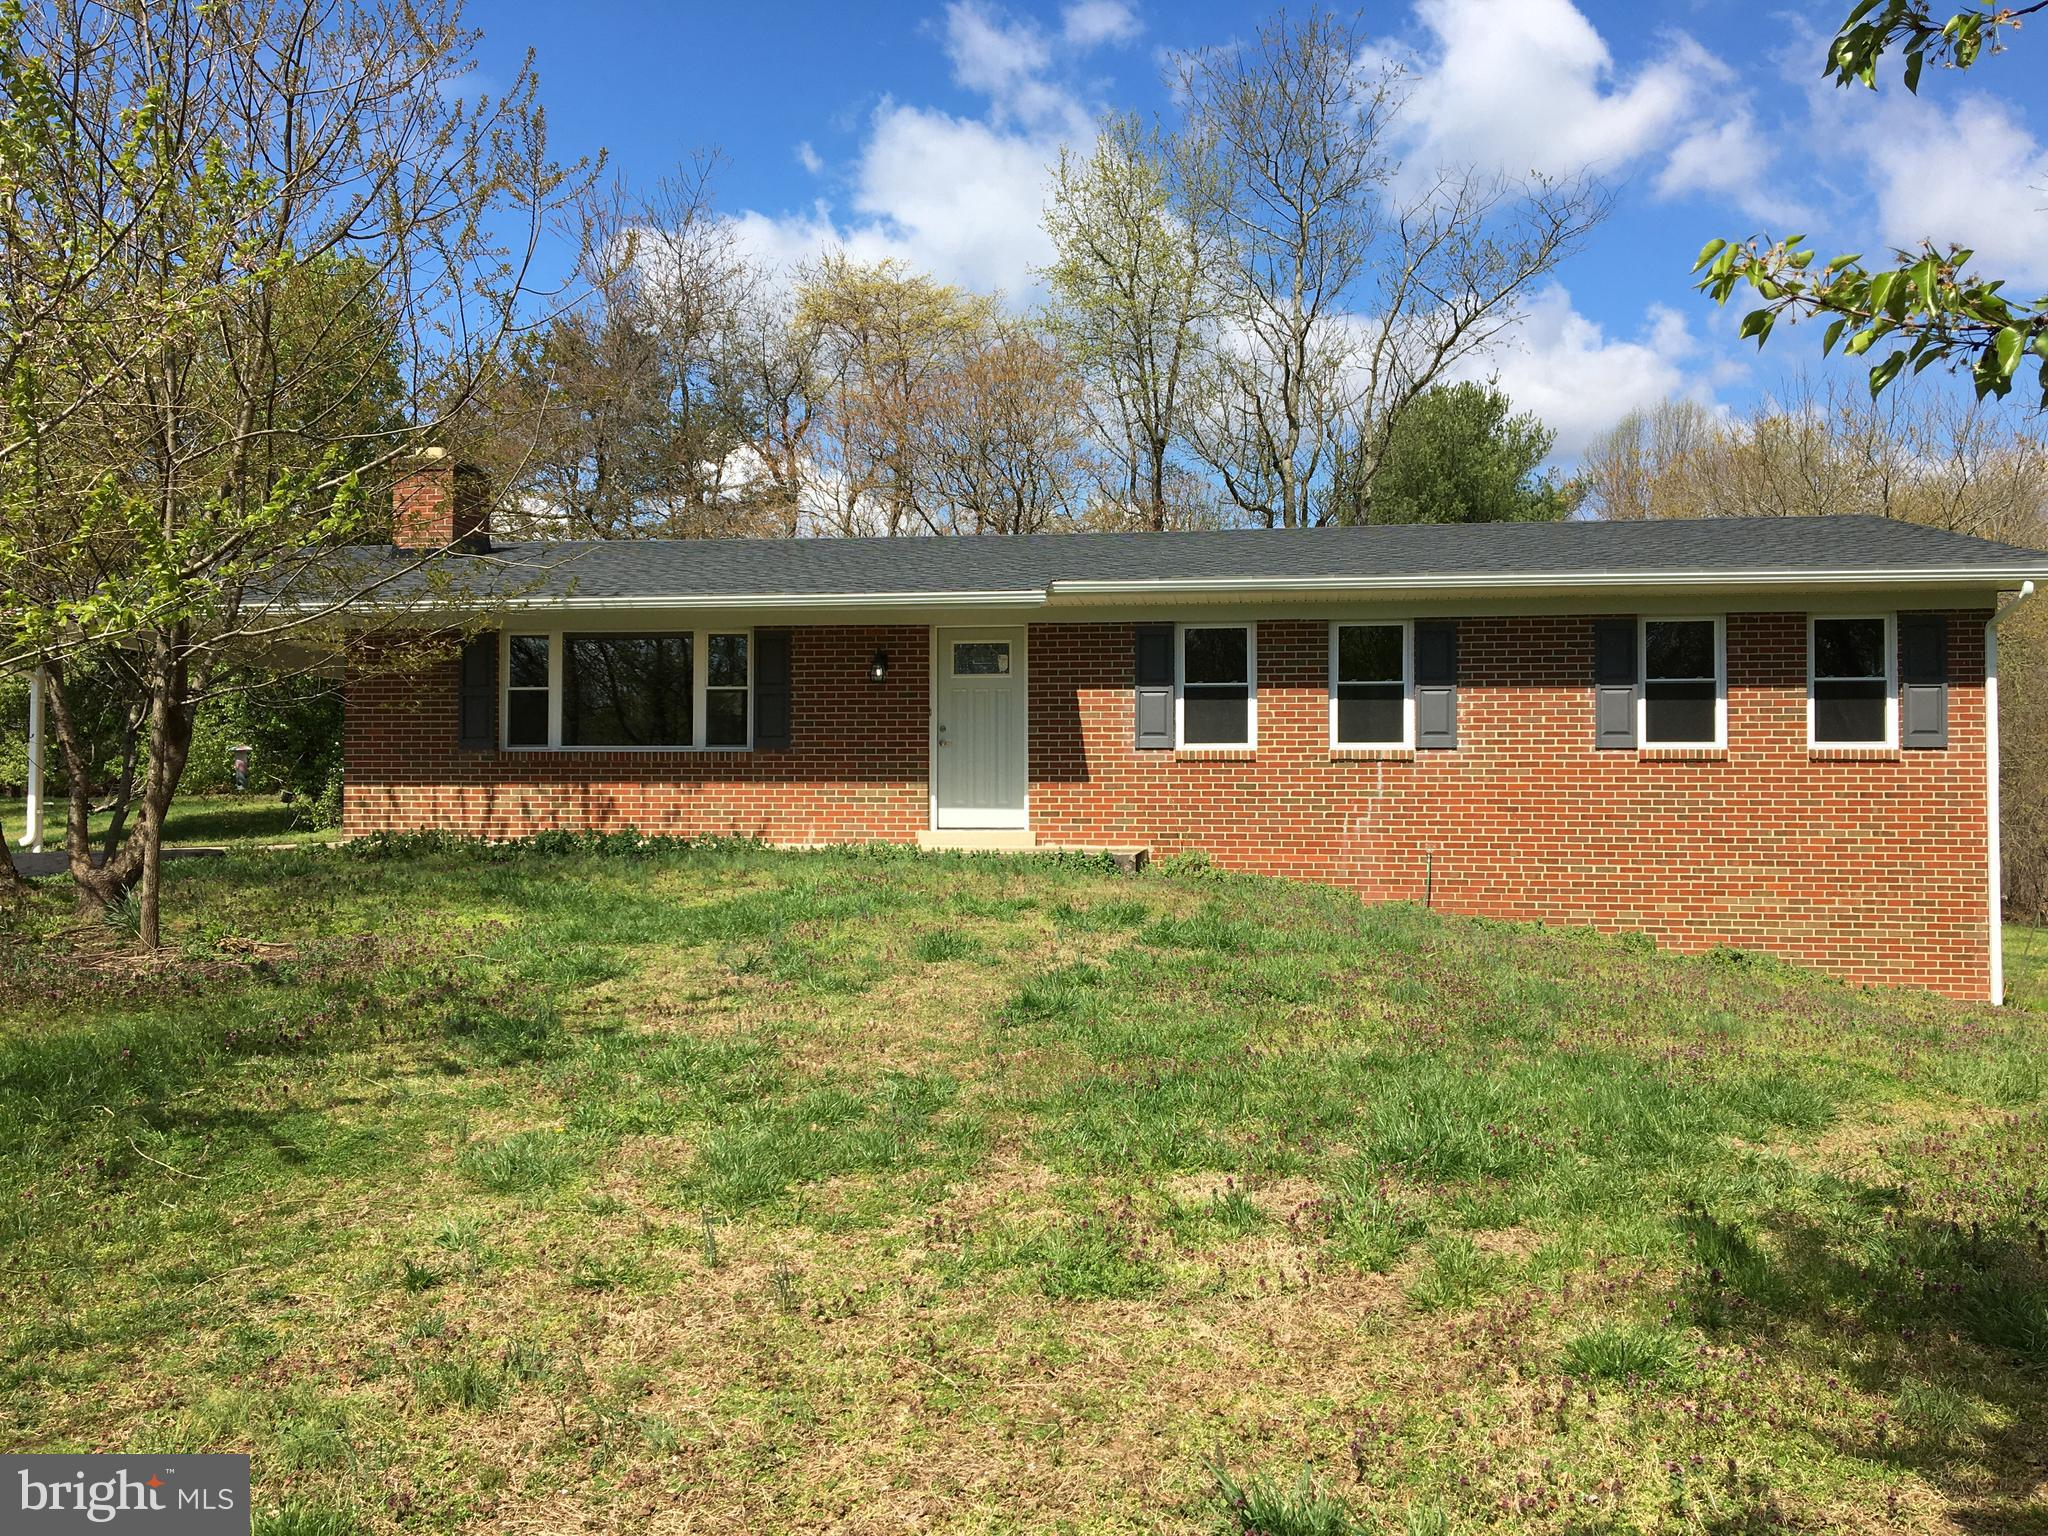 1965 Smoky Rd, Huntingtown, MD, 20639